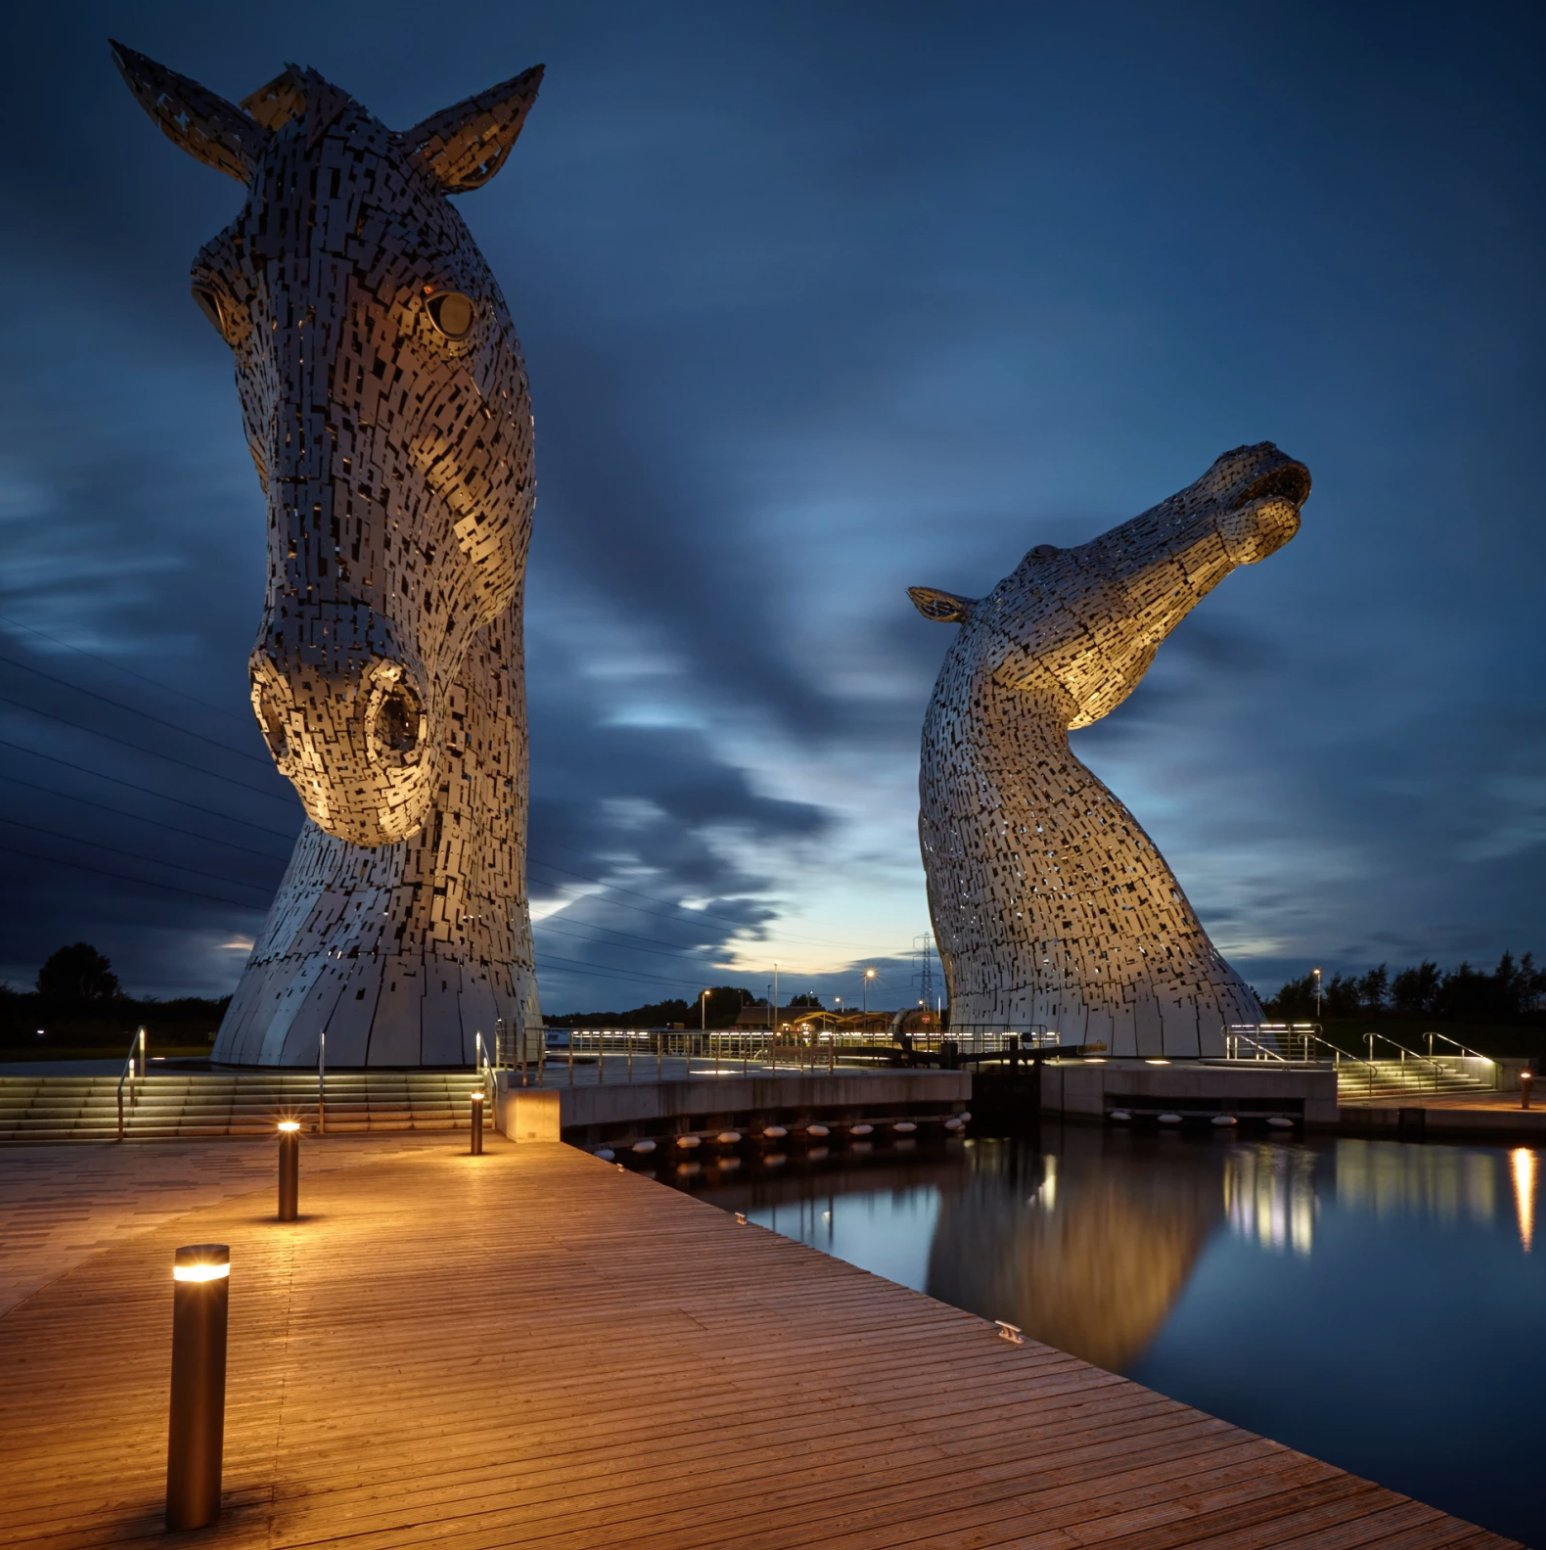 Torres Kelpies, Escocia. https://t.co/sJjfnwccQi